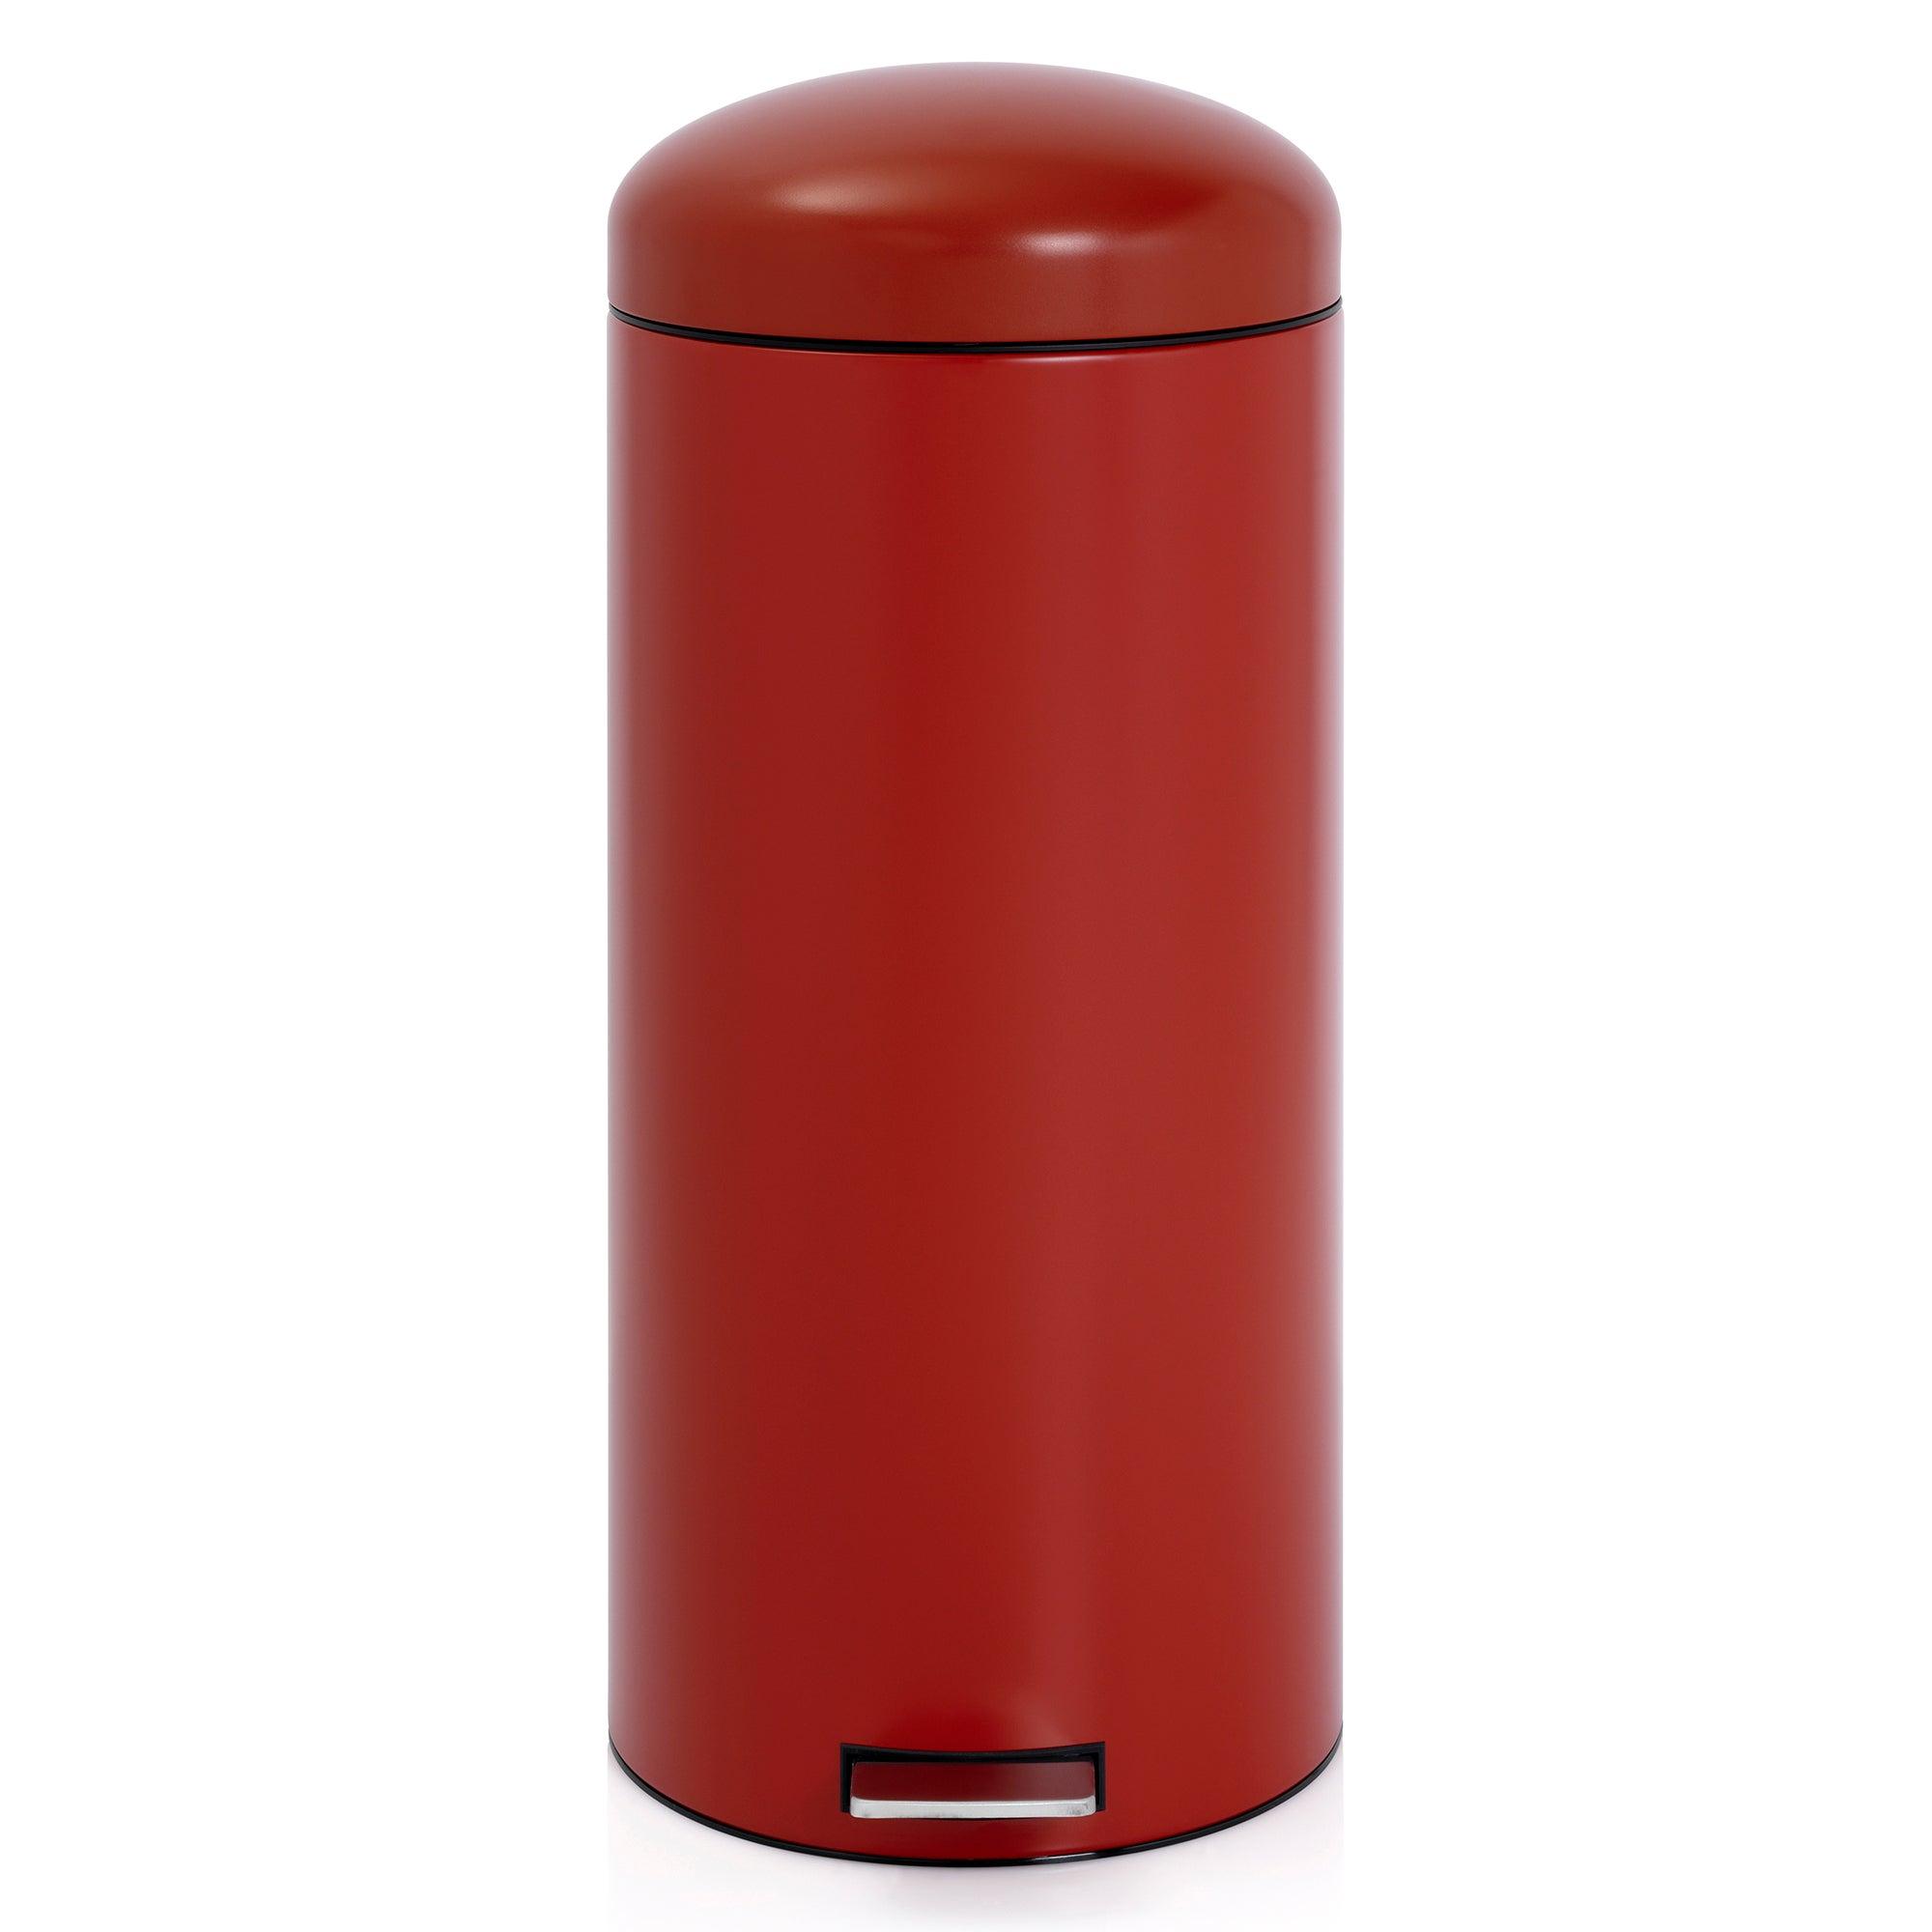 Brabantia Red 30 Litre Retro Pedal Bin